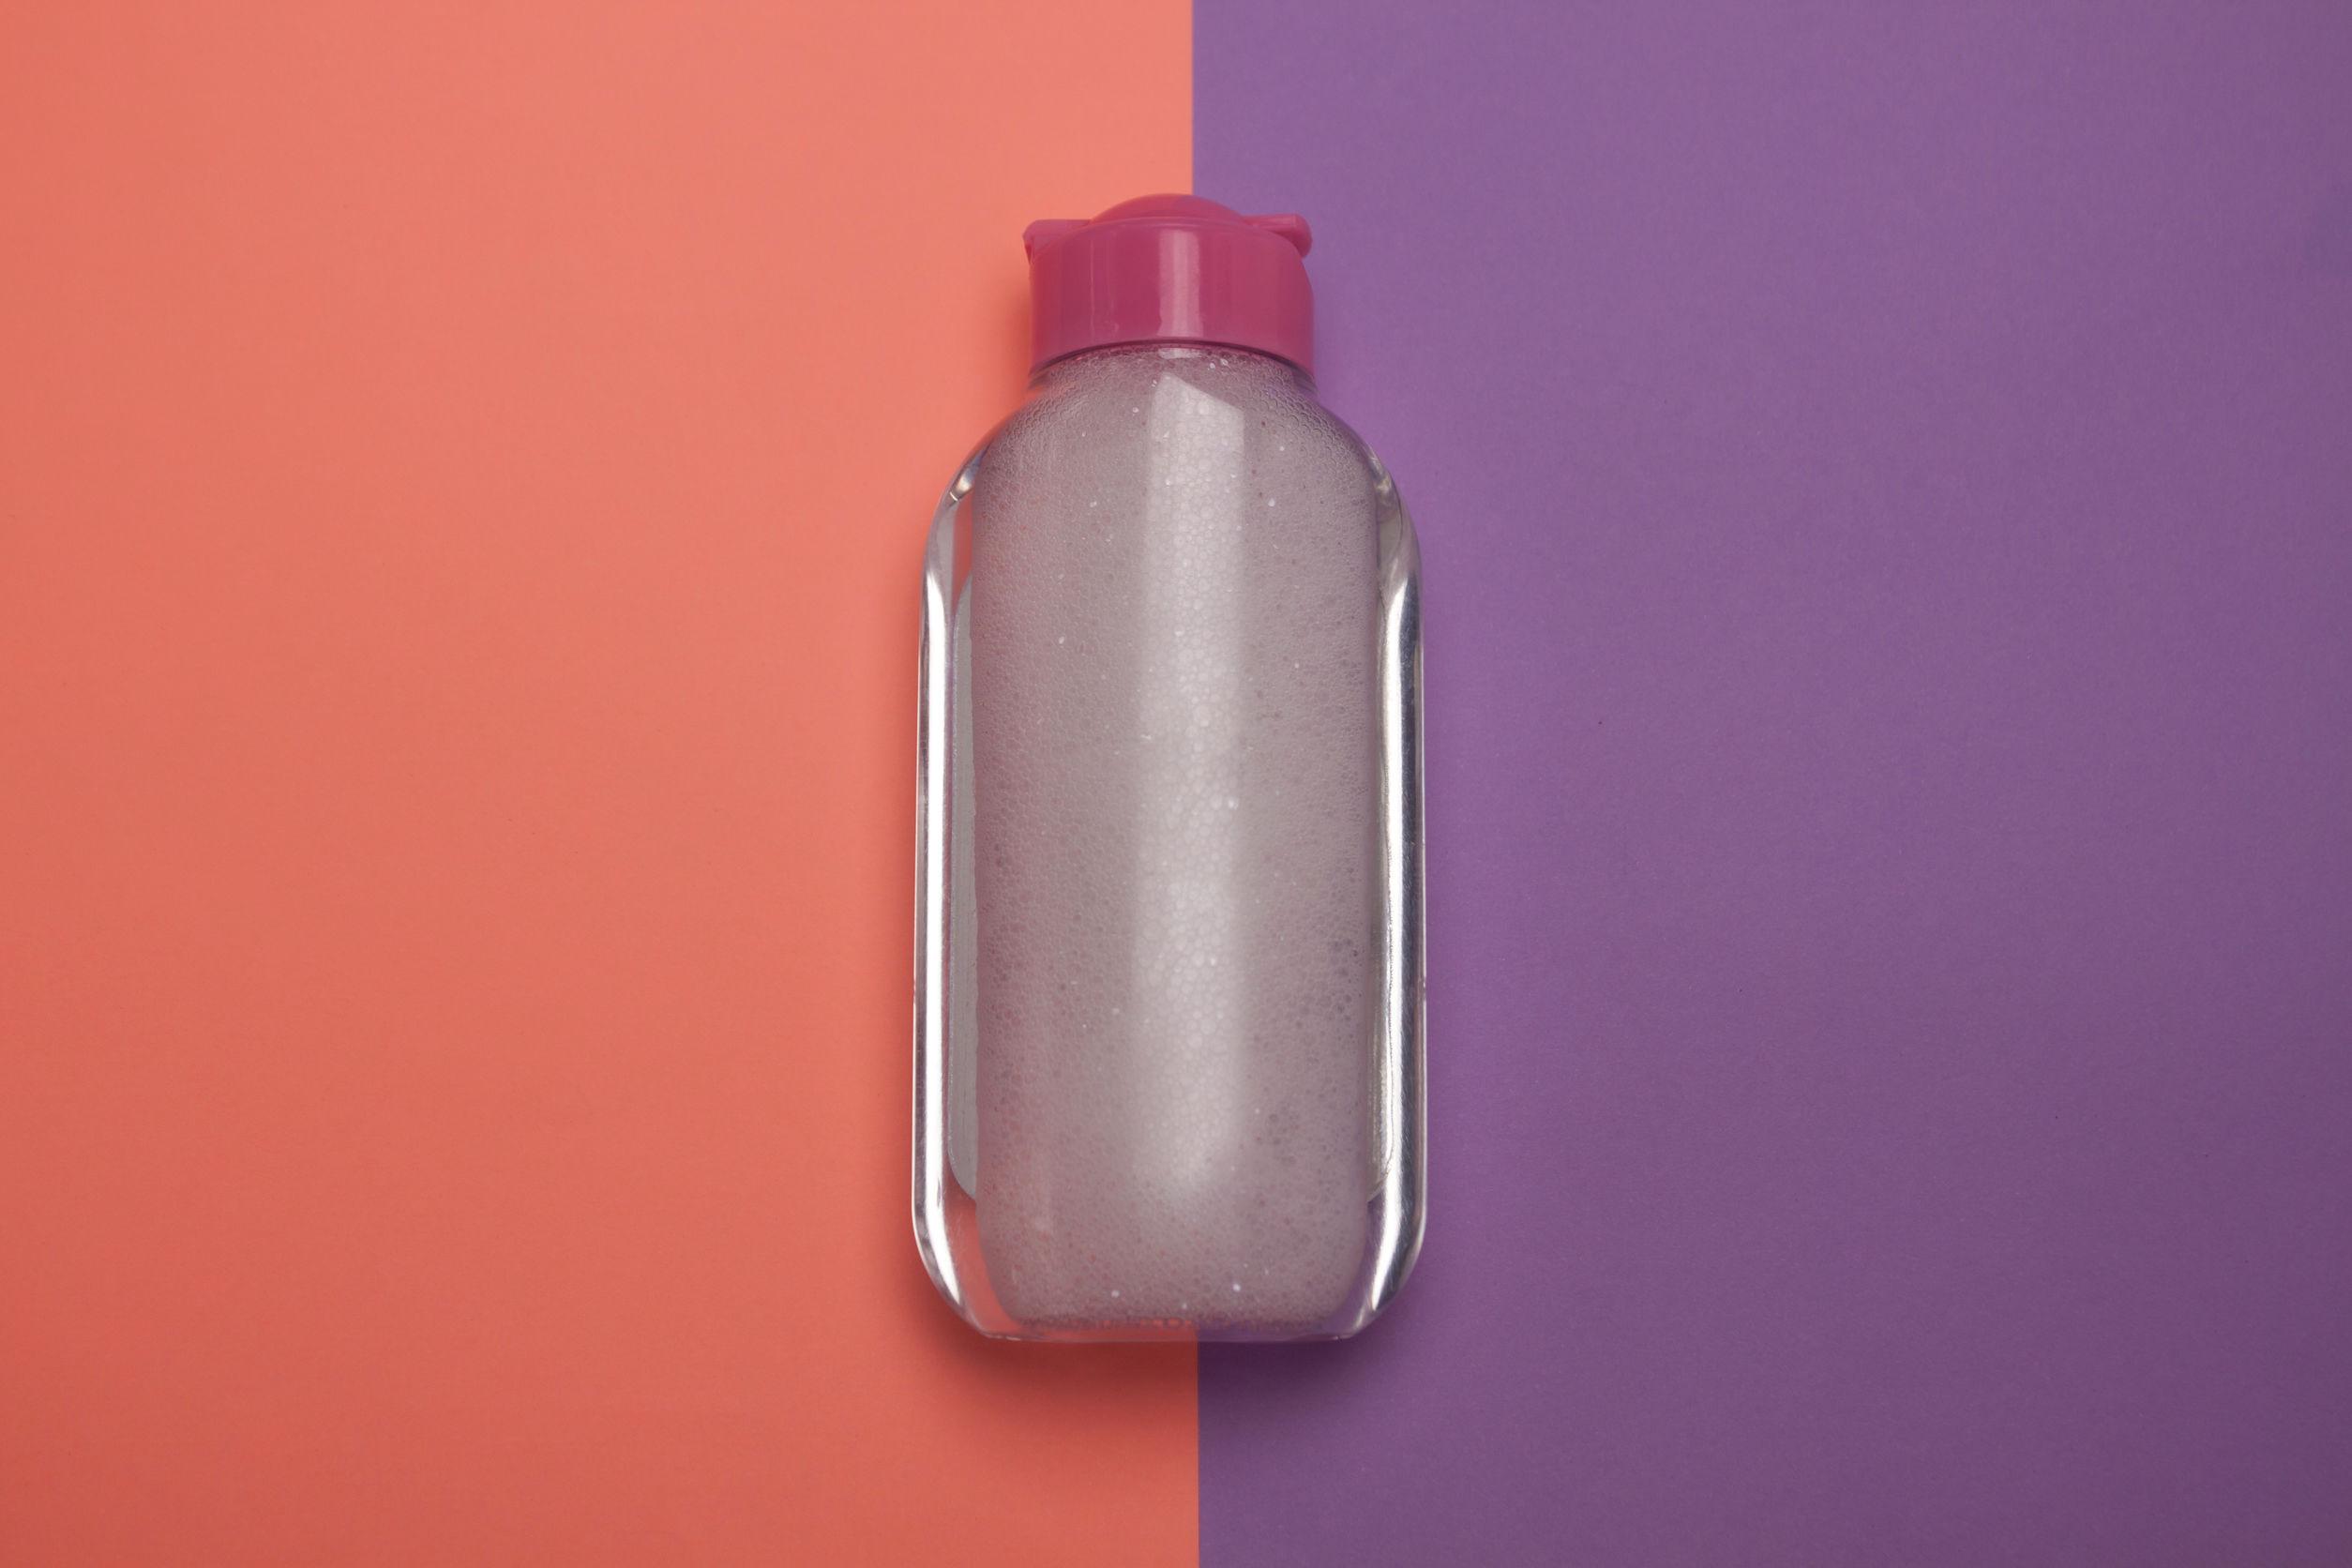 Agua Micelar: ¿Cuál es la mejor del 2021?